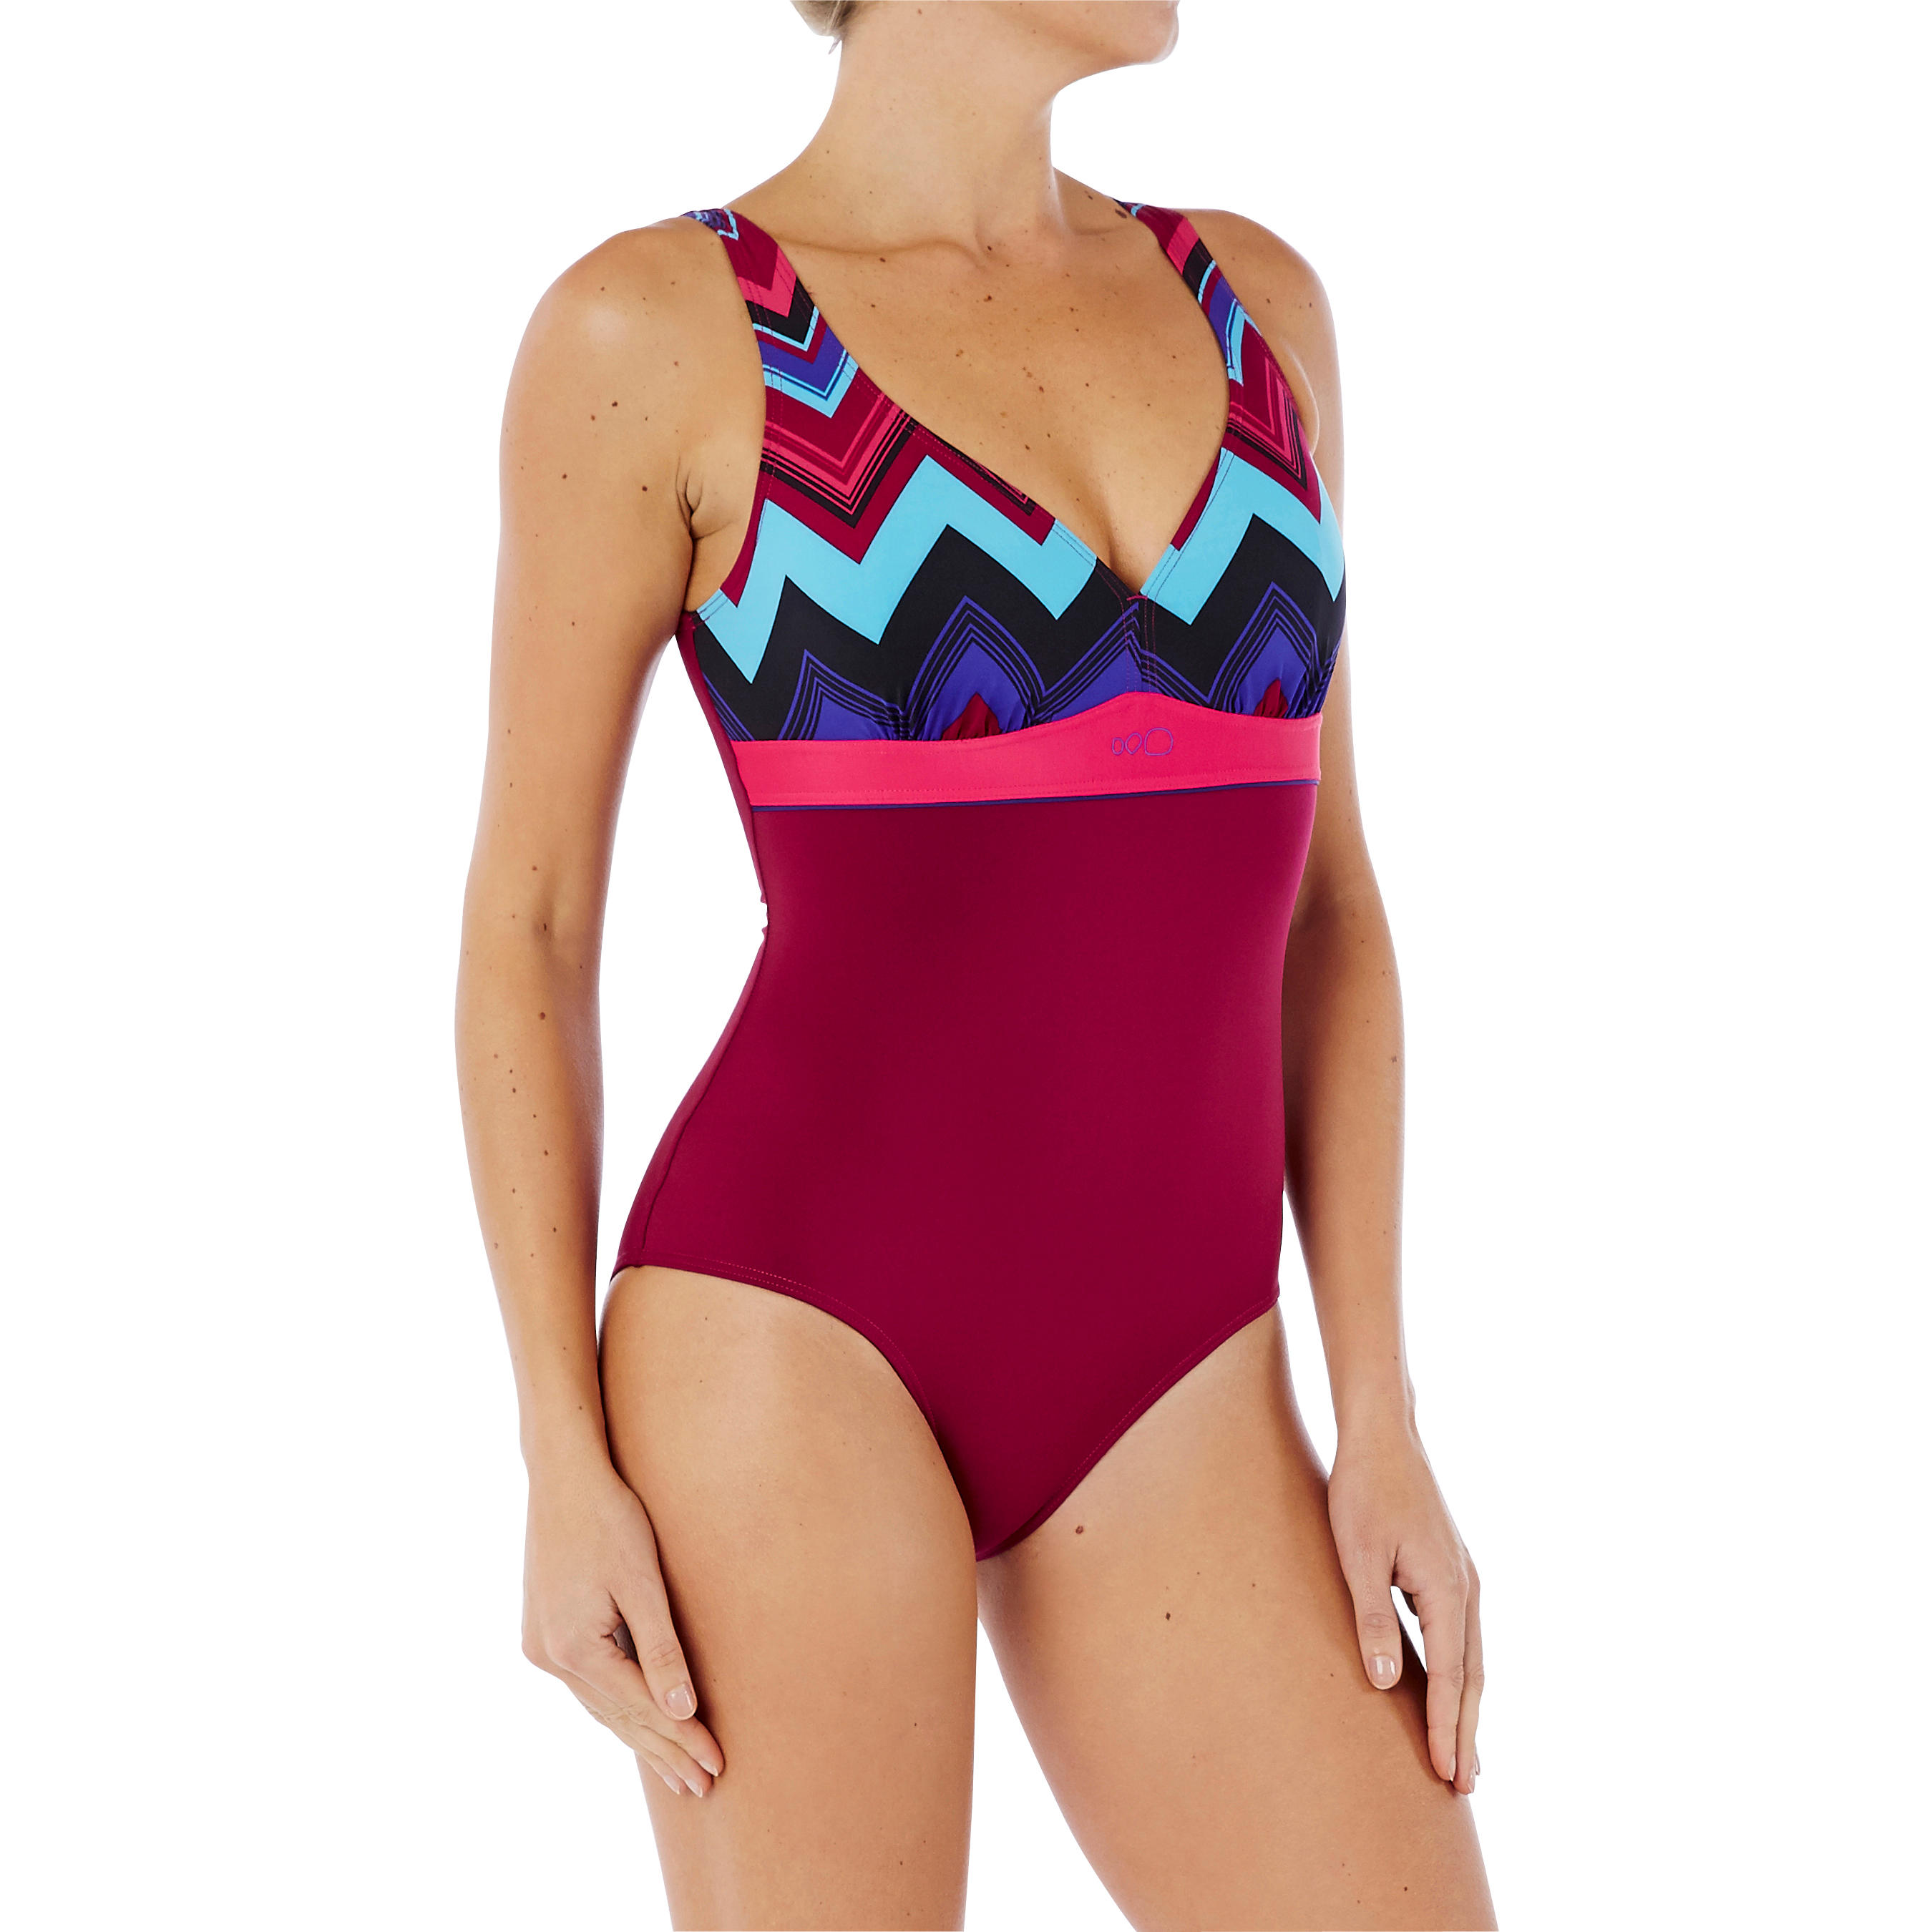 Kaipearl Women's Body-Sculpting One-Piece Swimsuit – Triki Purple